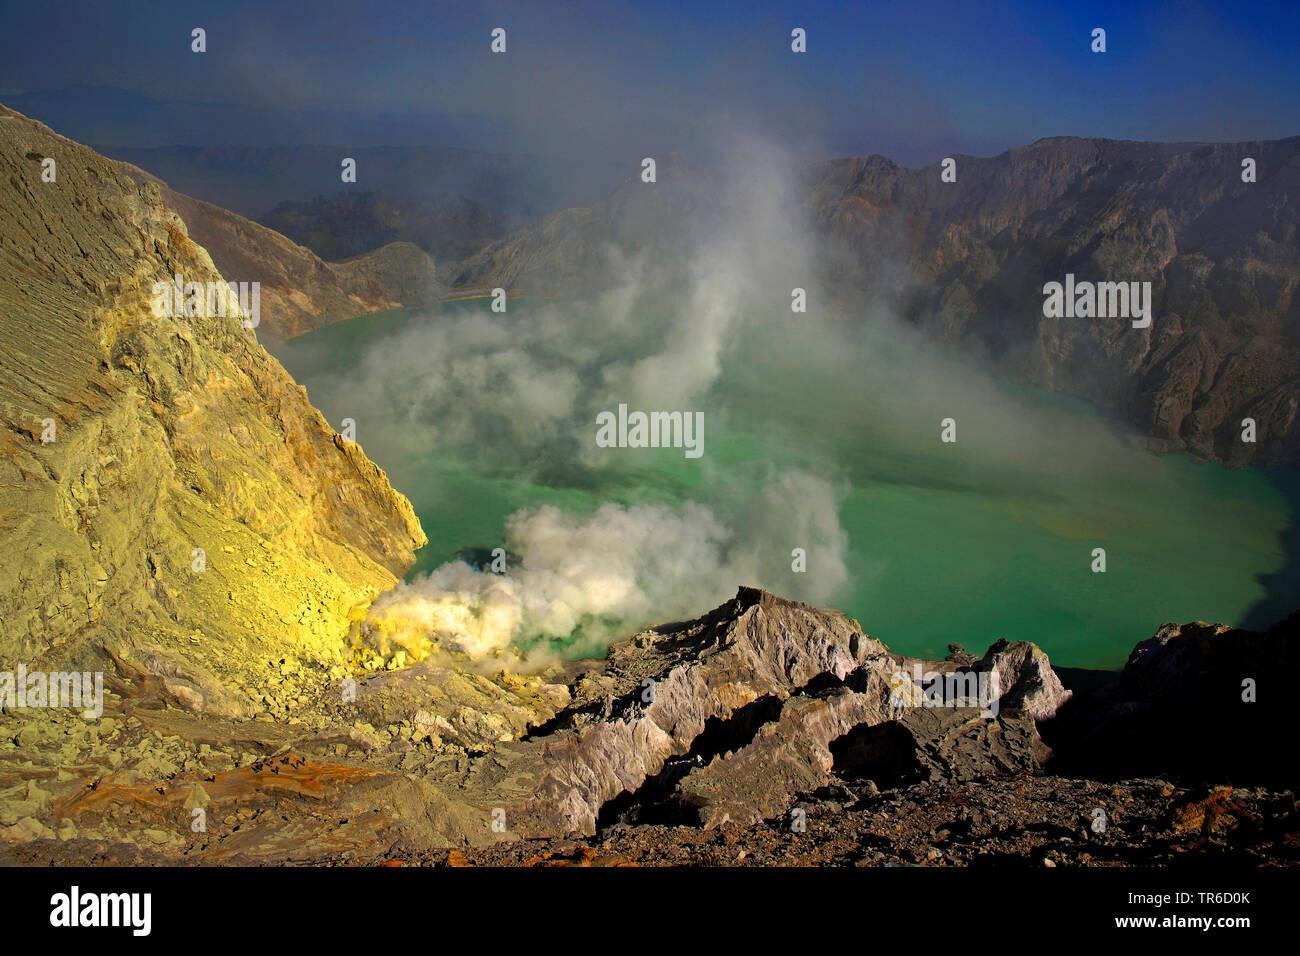 sulfuric lake of Kawah Ijen, Indonesia, Java, Bromo Tengger Semeru National Park - Stock Image